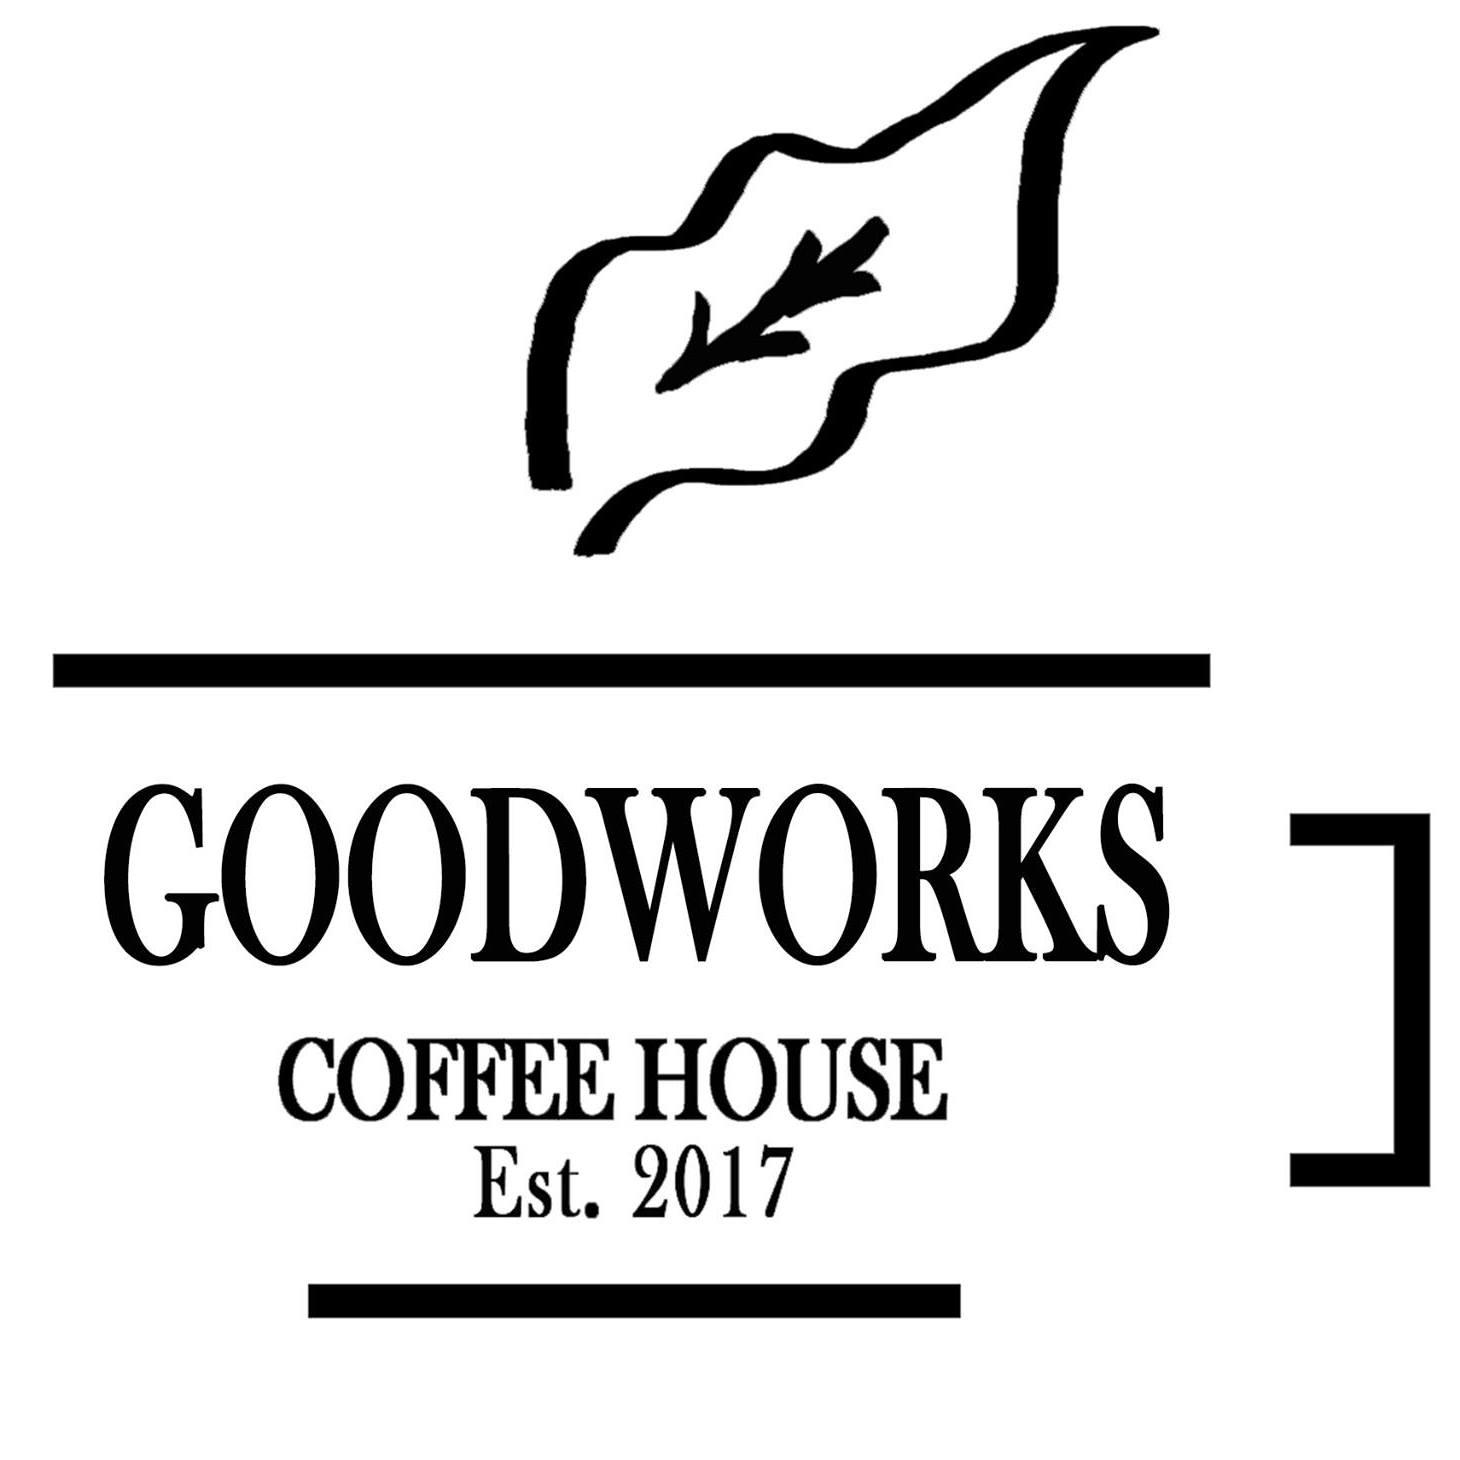 Full Service Espresso Bar & Retail Bags - 46 Center Street,Chicopee, MA 01013